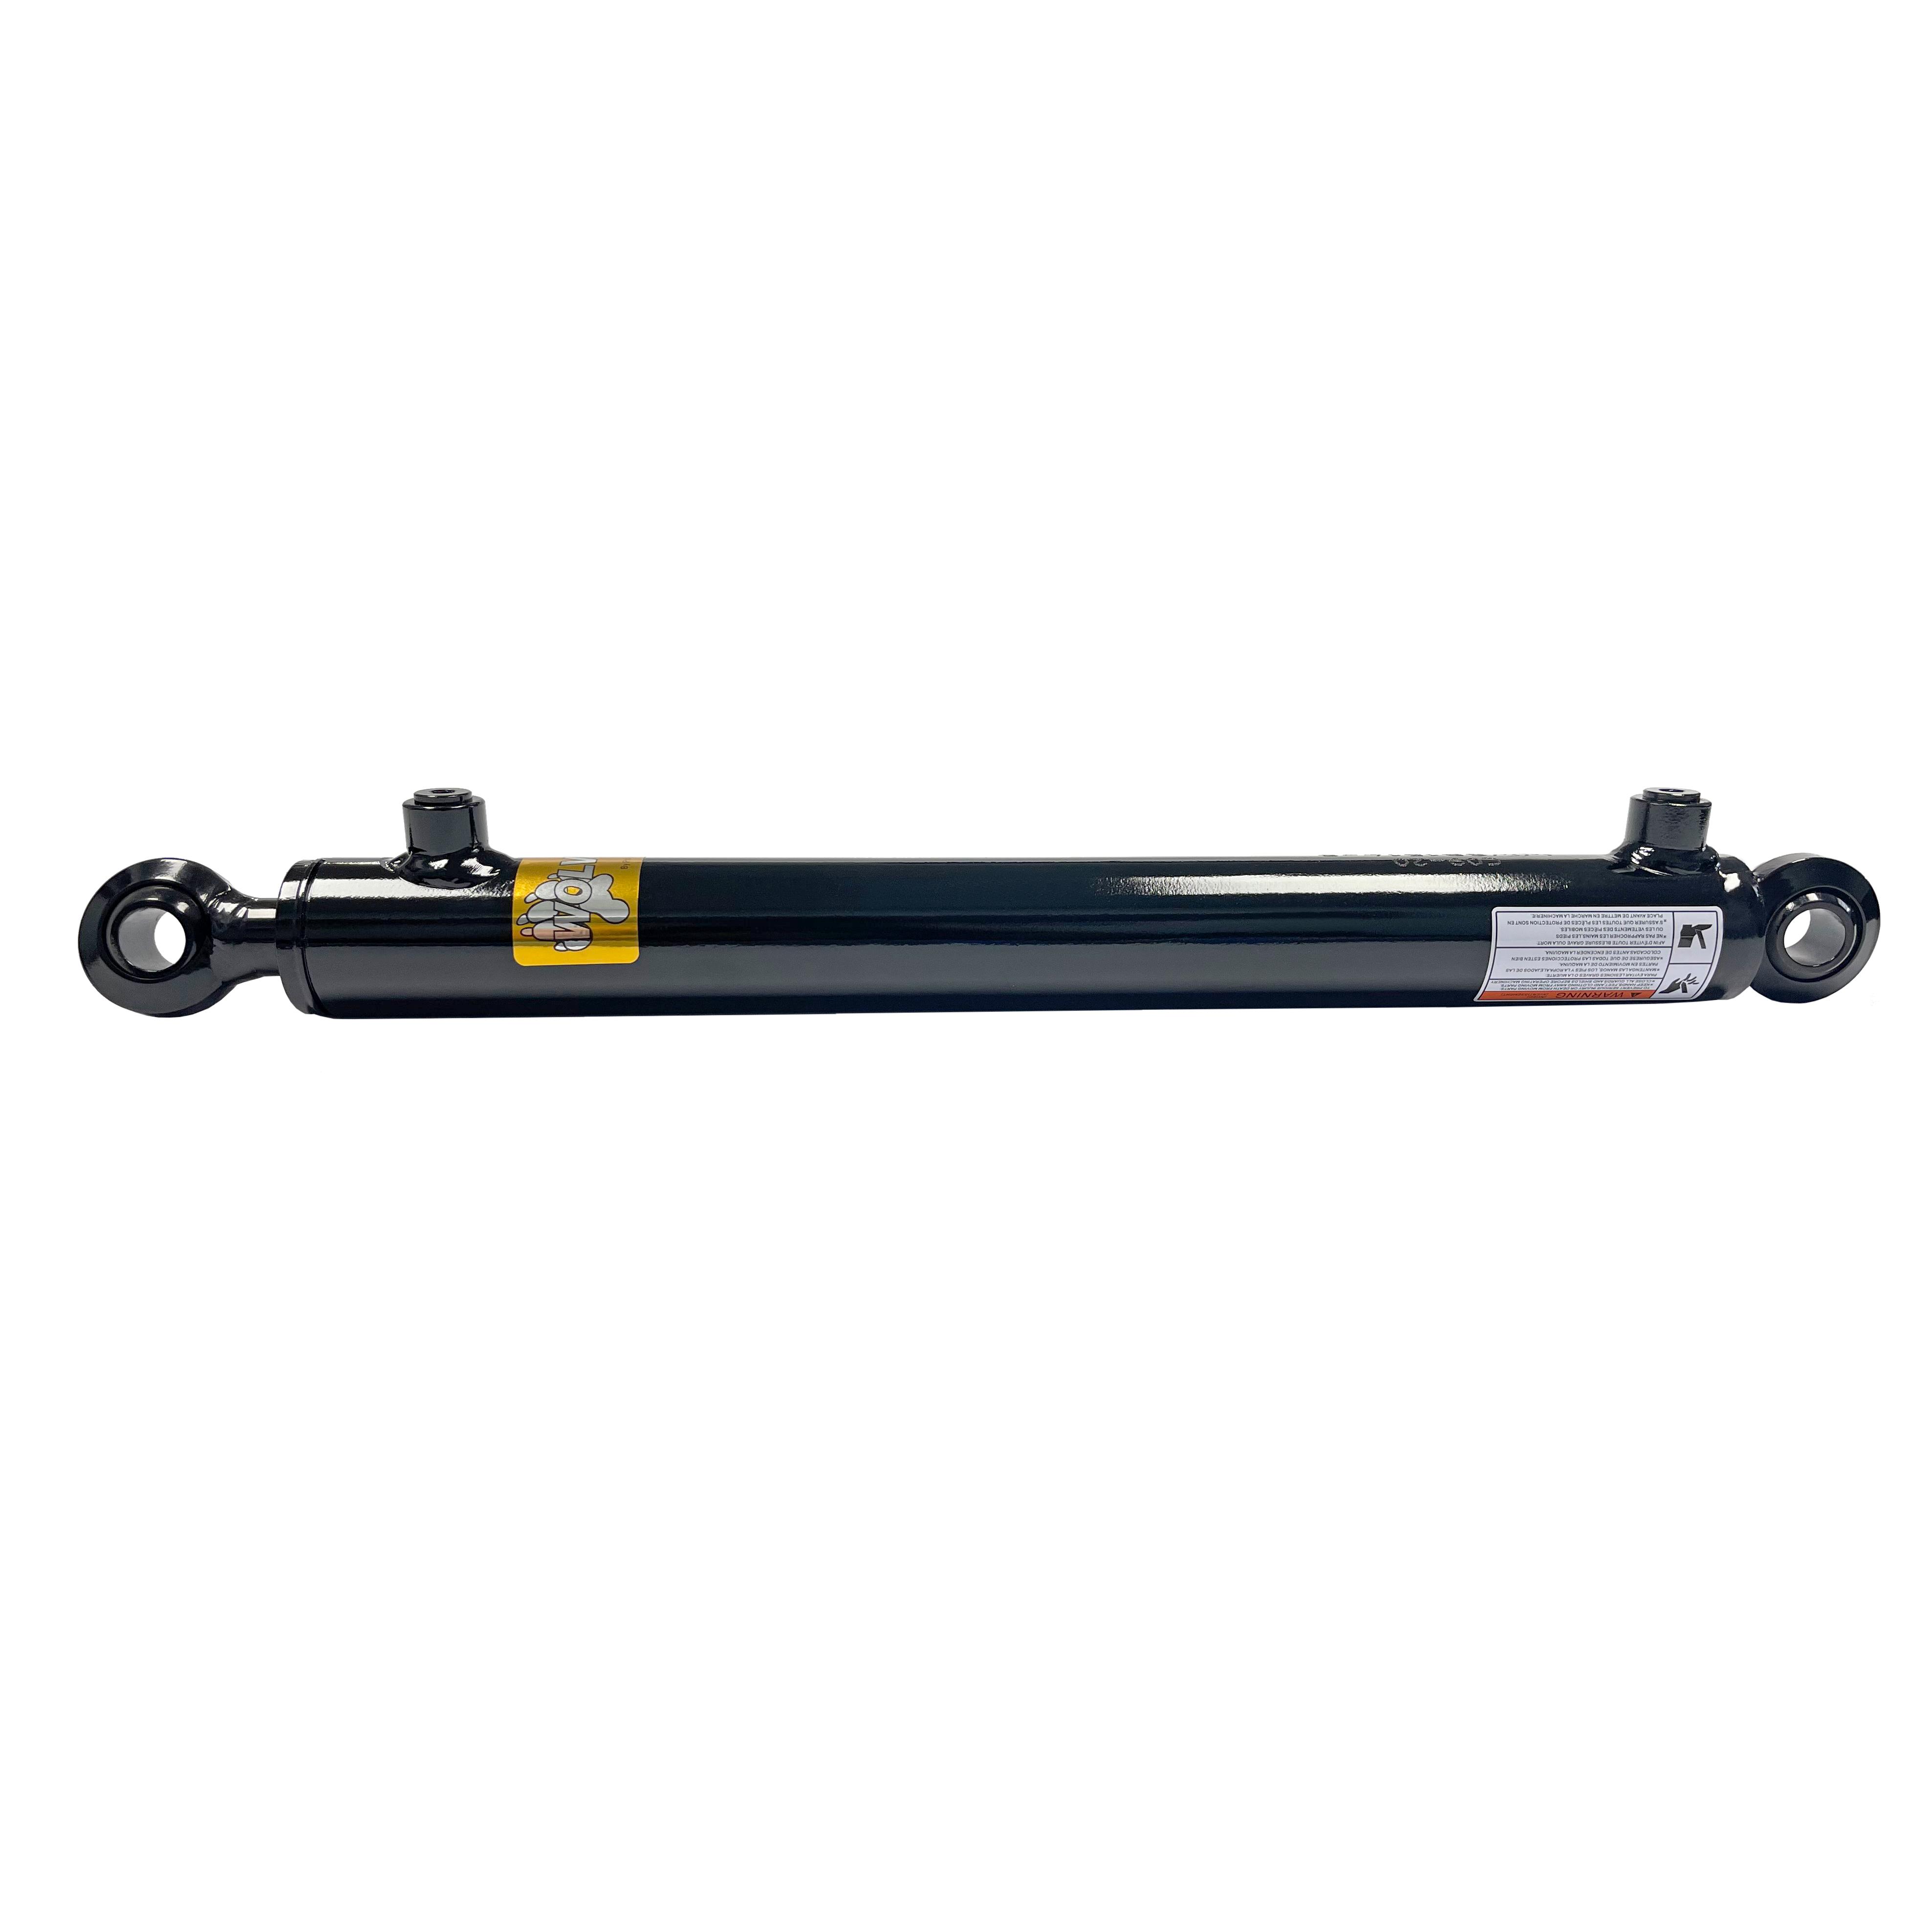 1 bore x 8 stroke swivel eye hydraulic cylinder, welded swivel eye double acting cylinder | Prince Hydraulics